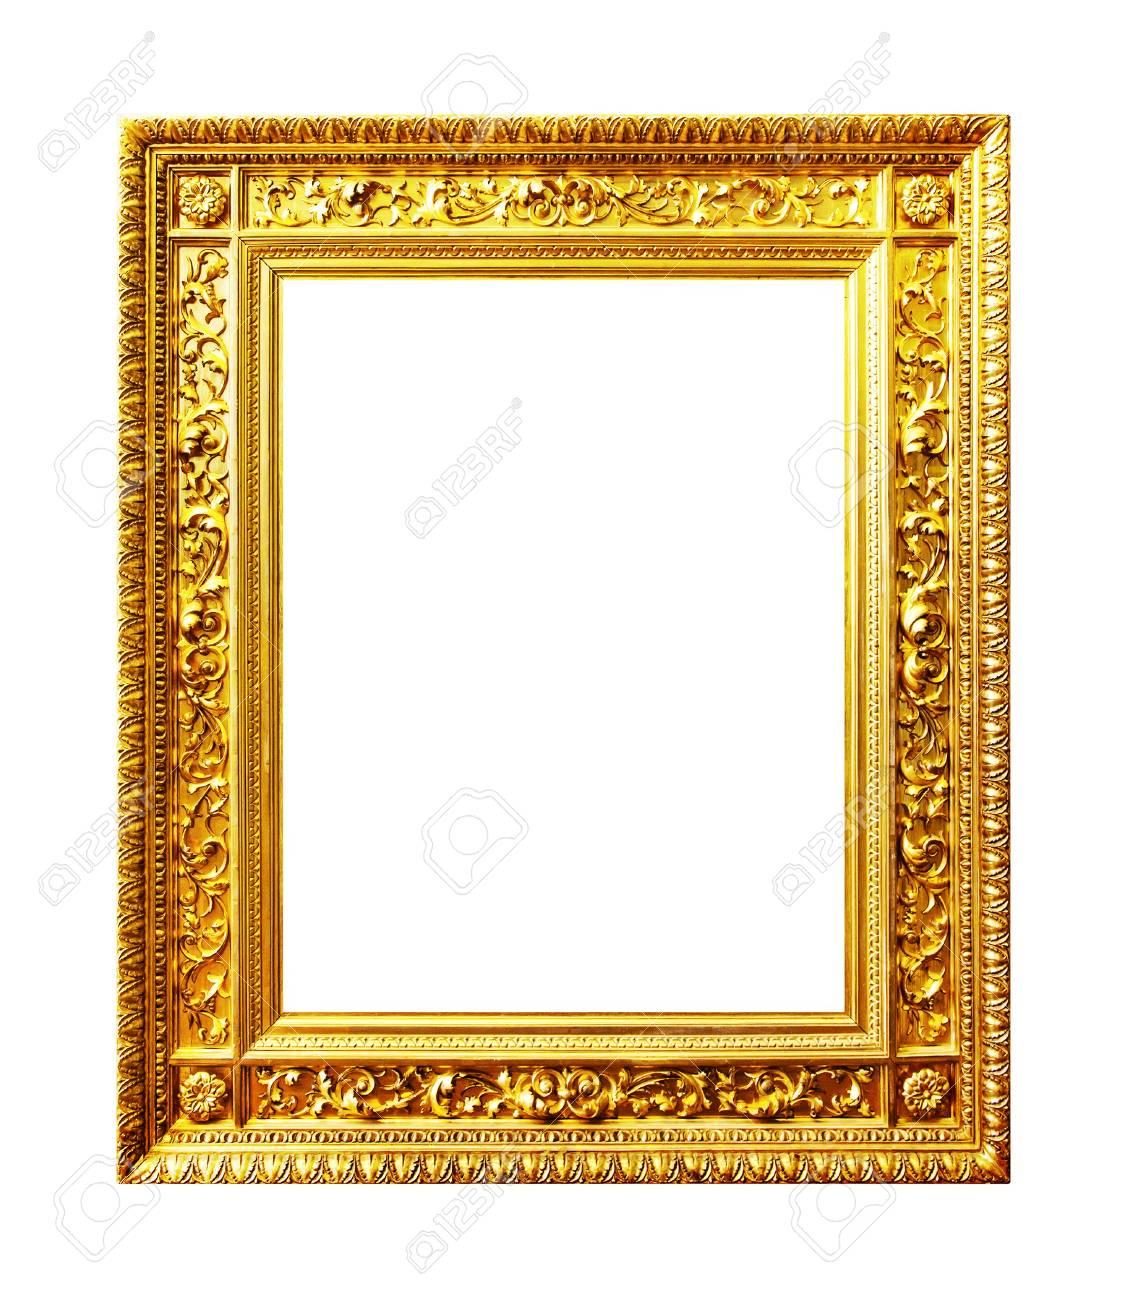 Antique Gilded Frame Isolated On White Background Stock Photo ...